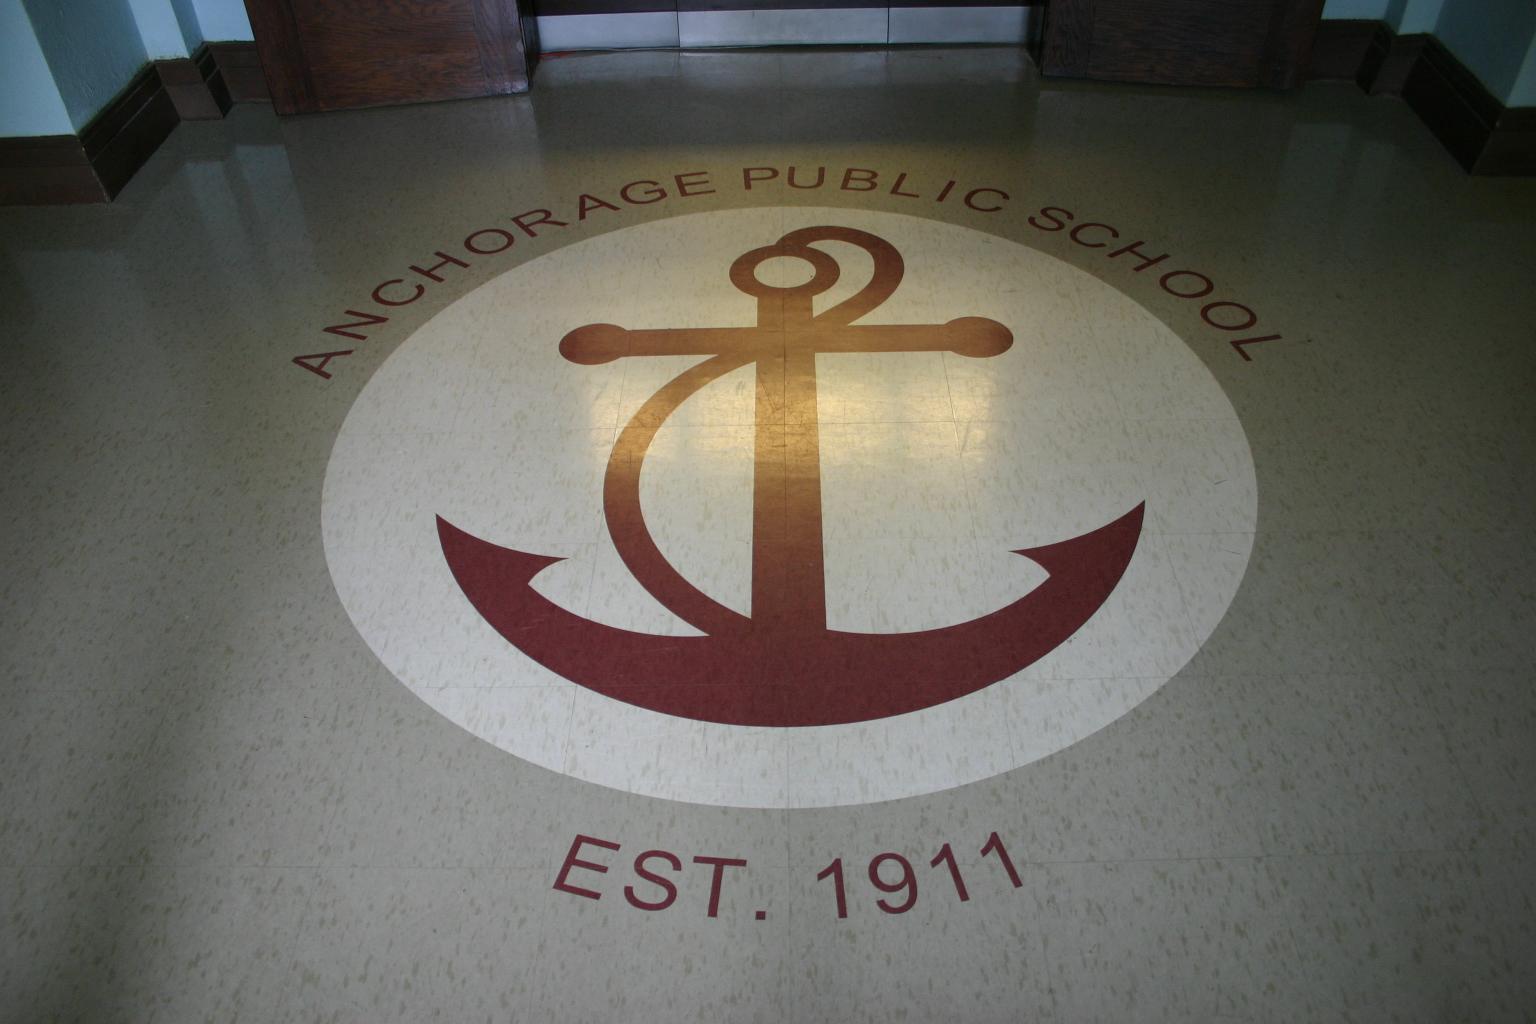 Anchorage Public School Crest